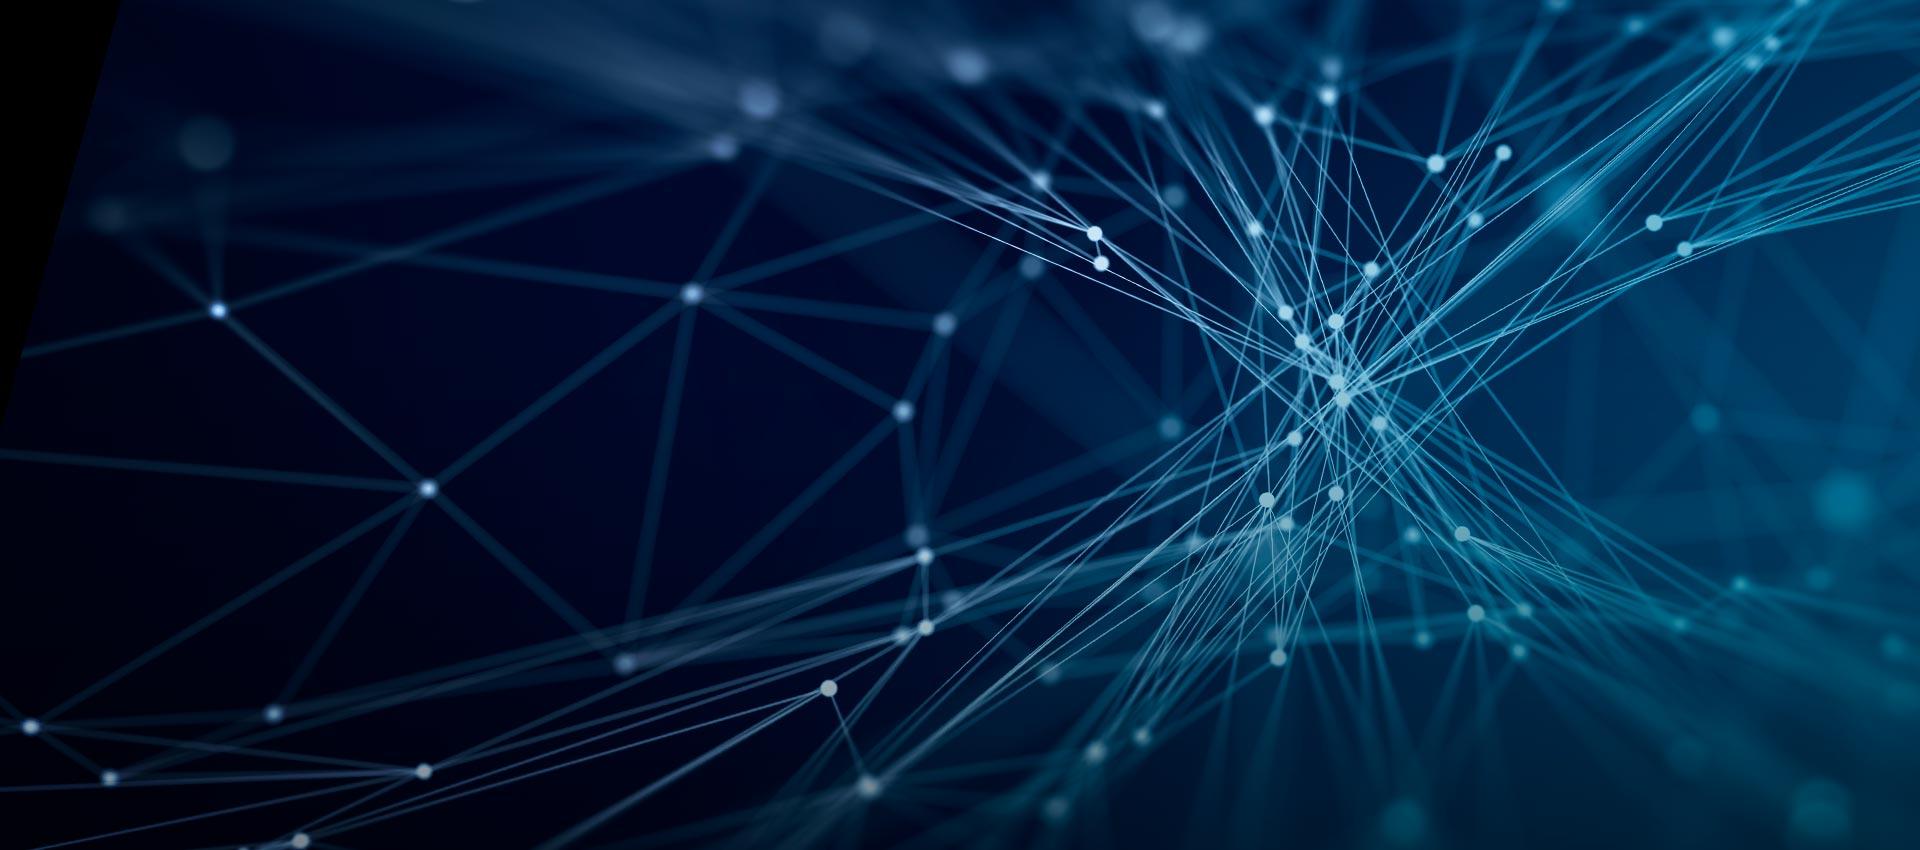 Newsroom Post TechTarget: Enel is digitally transforming